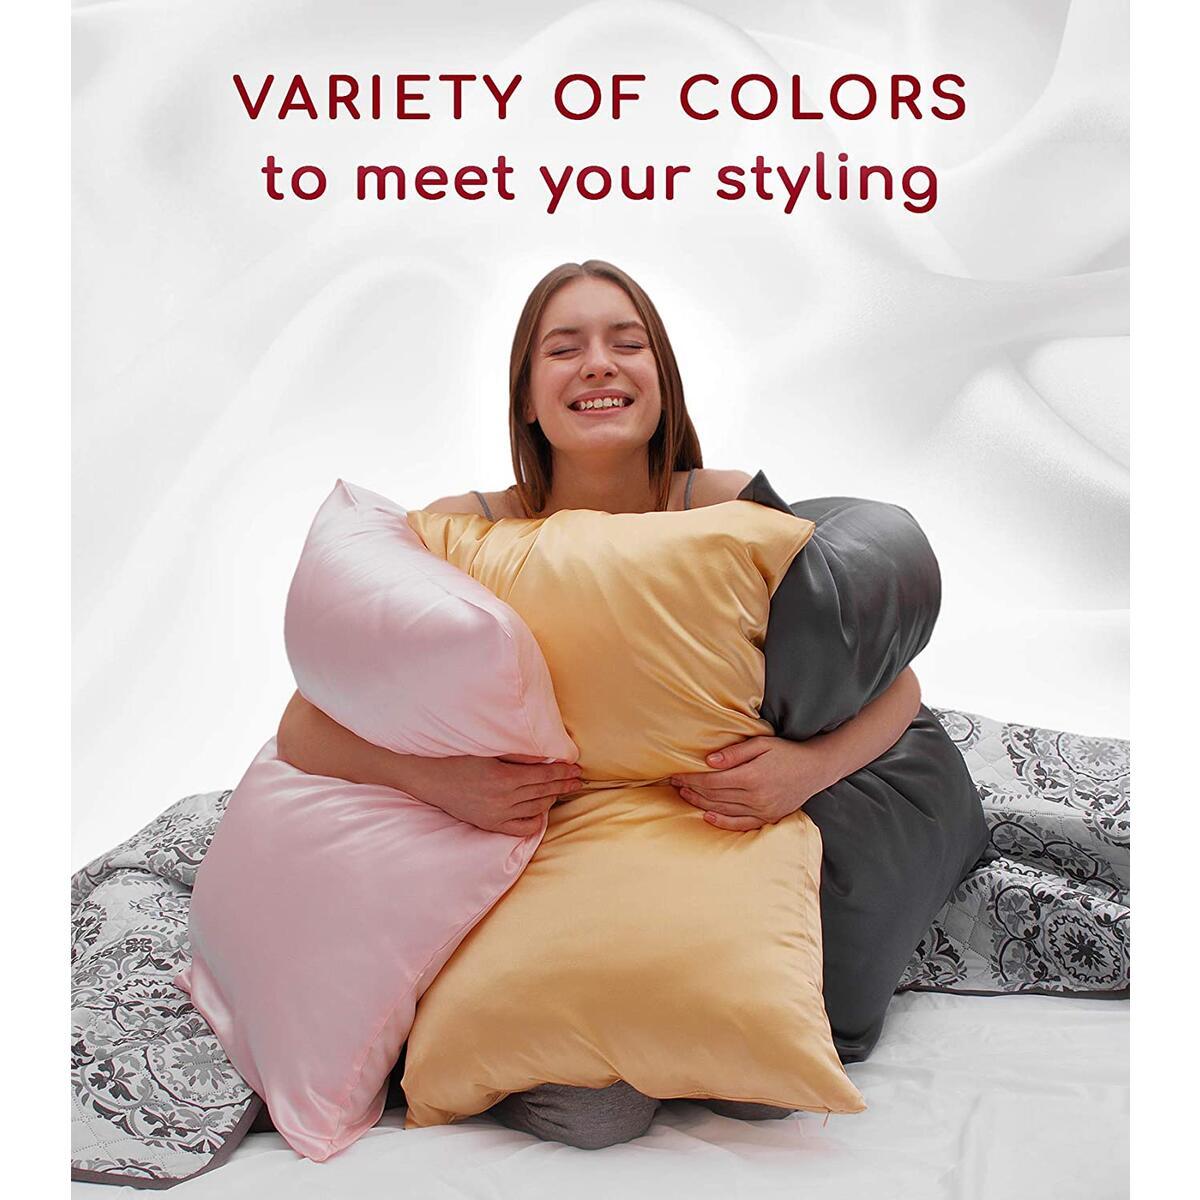 Mellanni Silk Pillowcase for Hair and Skin - Both Sides 100% Pure Natural Mulberry Silk - 19 Momme - Hidden Zipper ClosurePillow Case- (King 20